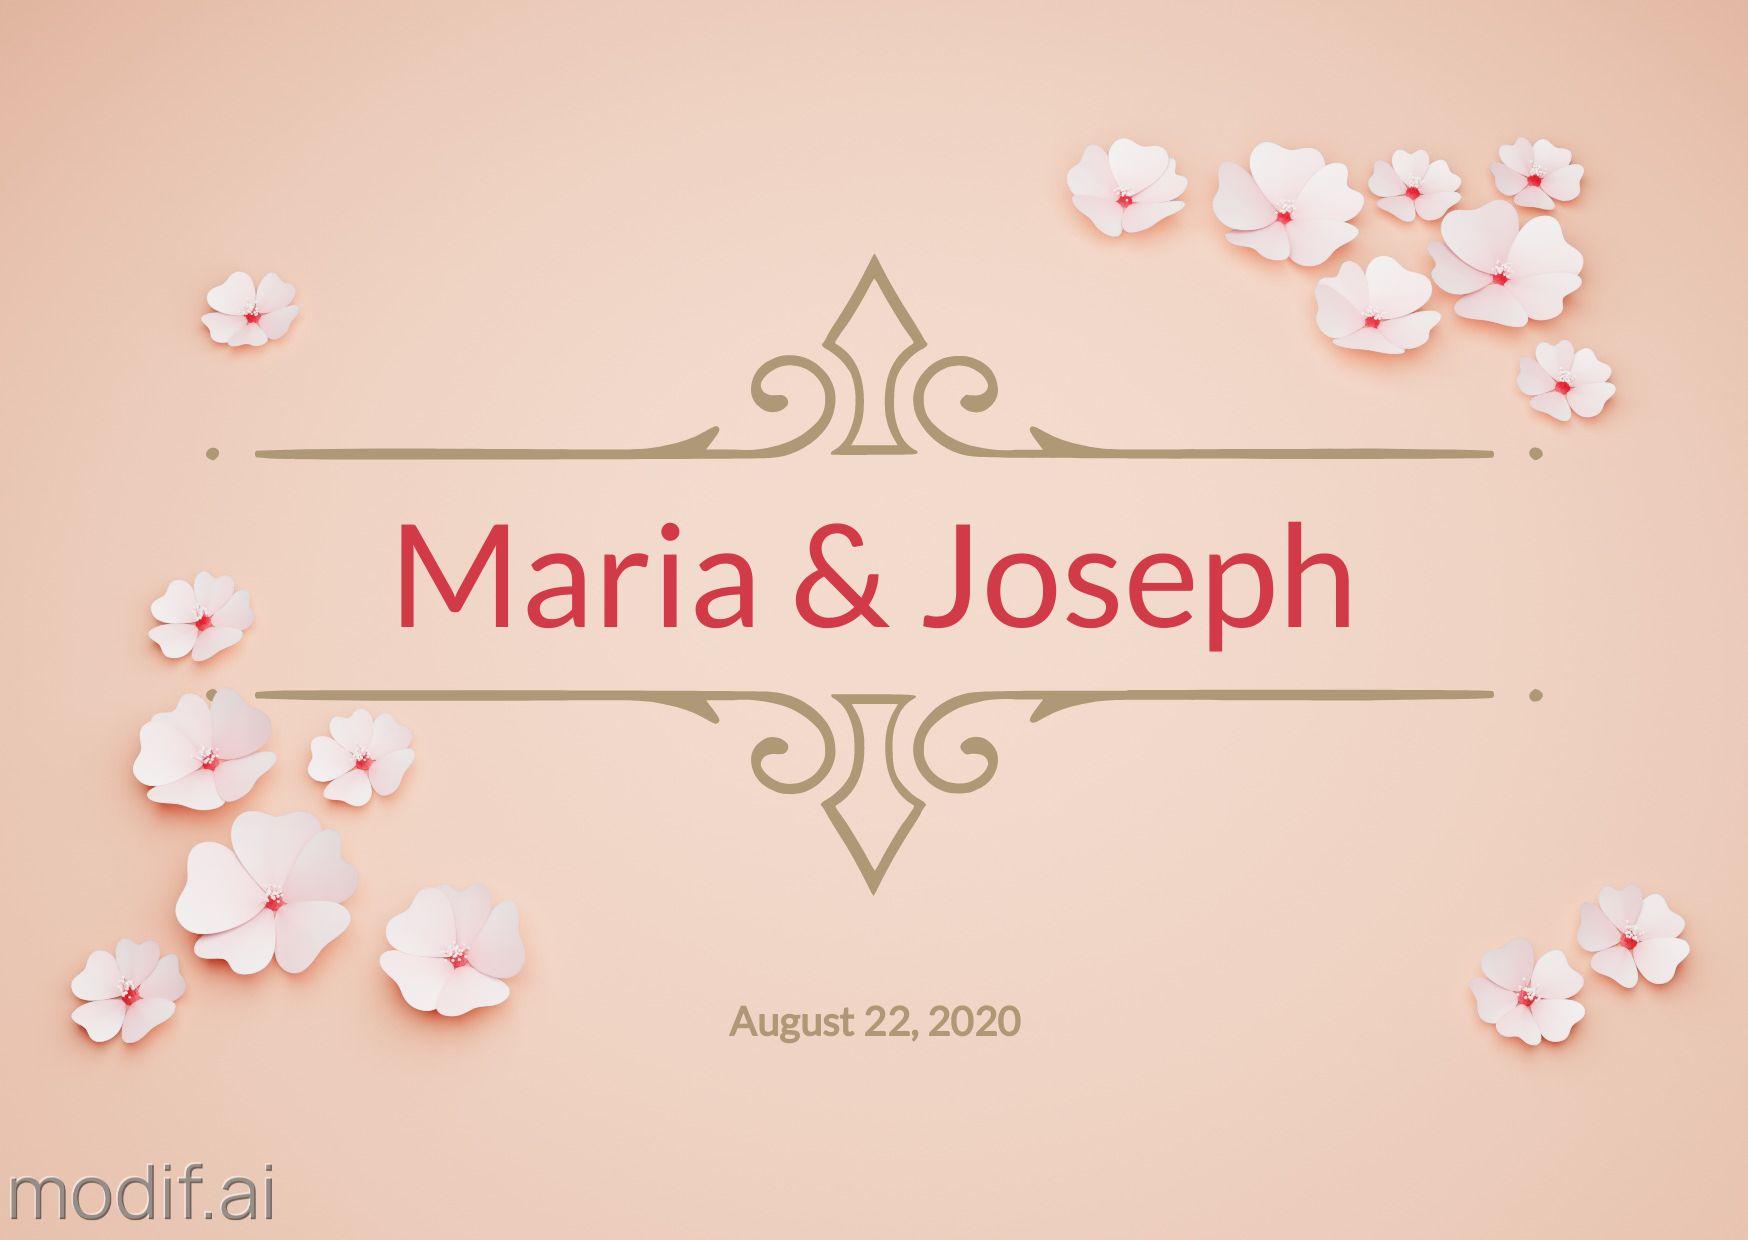 Wedding Date Greeting Card